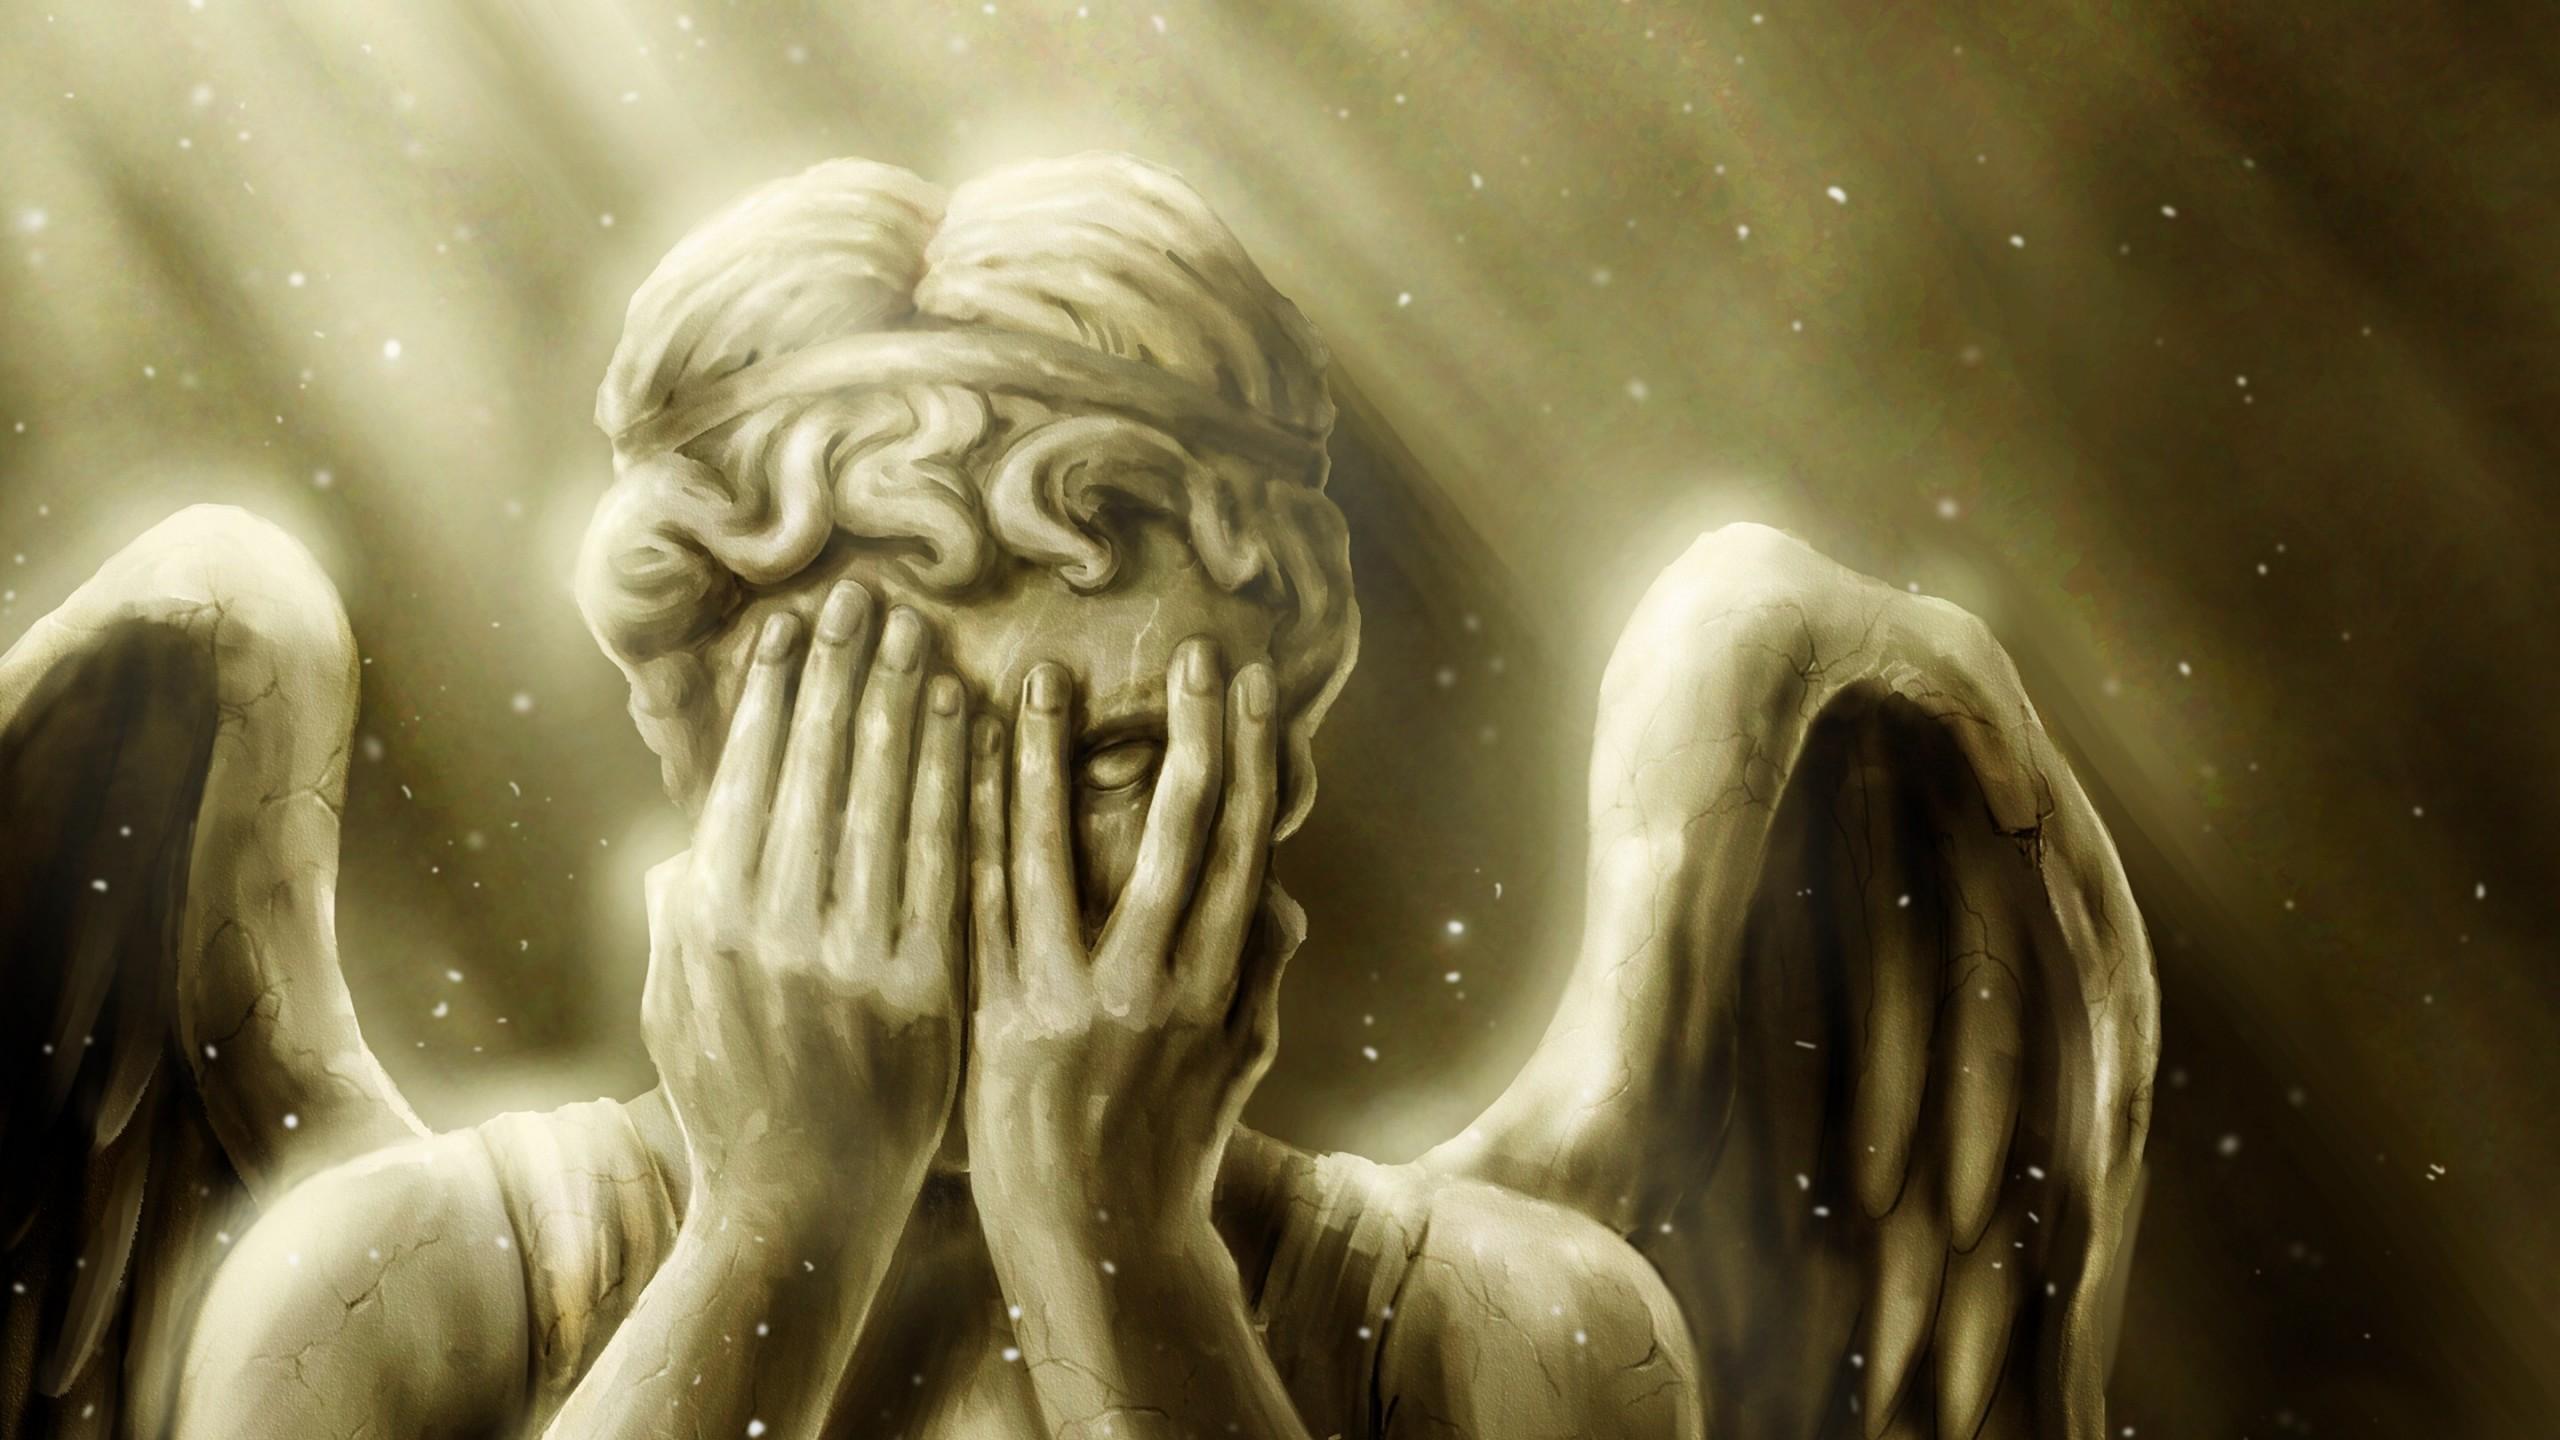 weeping angel desktop wallpaper wallpapersafari